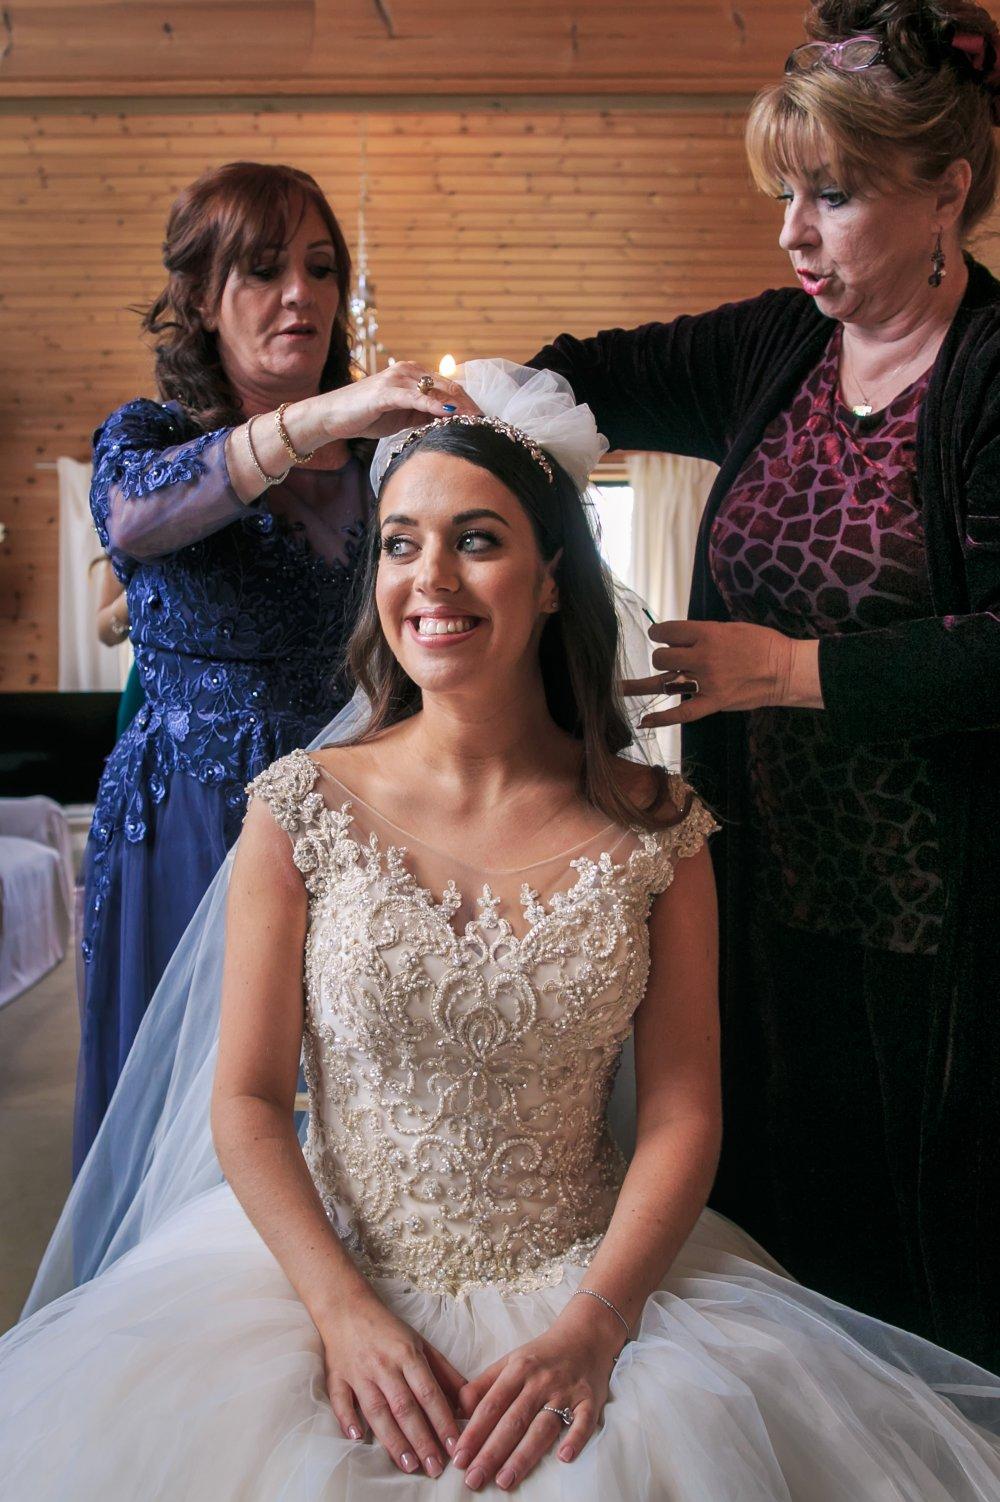 Pin On Wedding Dresses We Are Selling On Www Sellmyweddingdress Co Uk